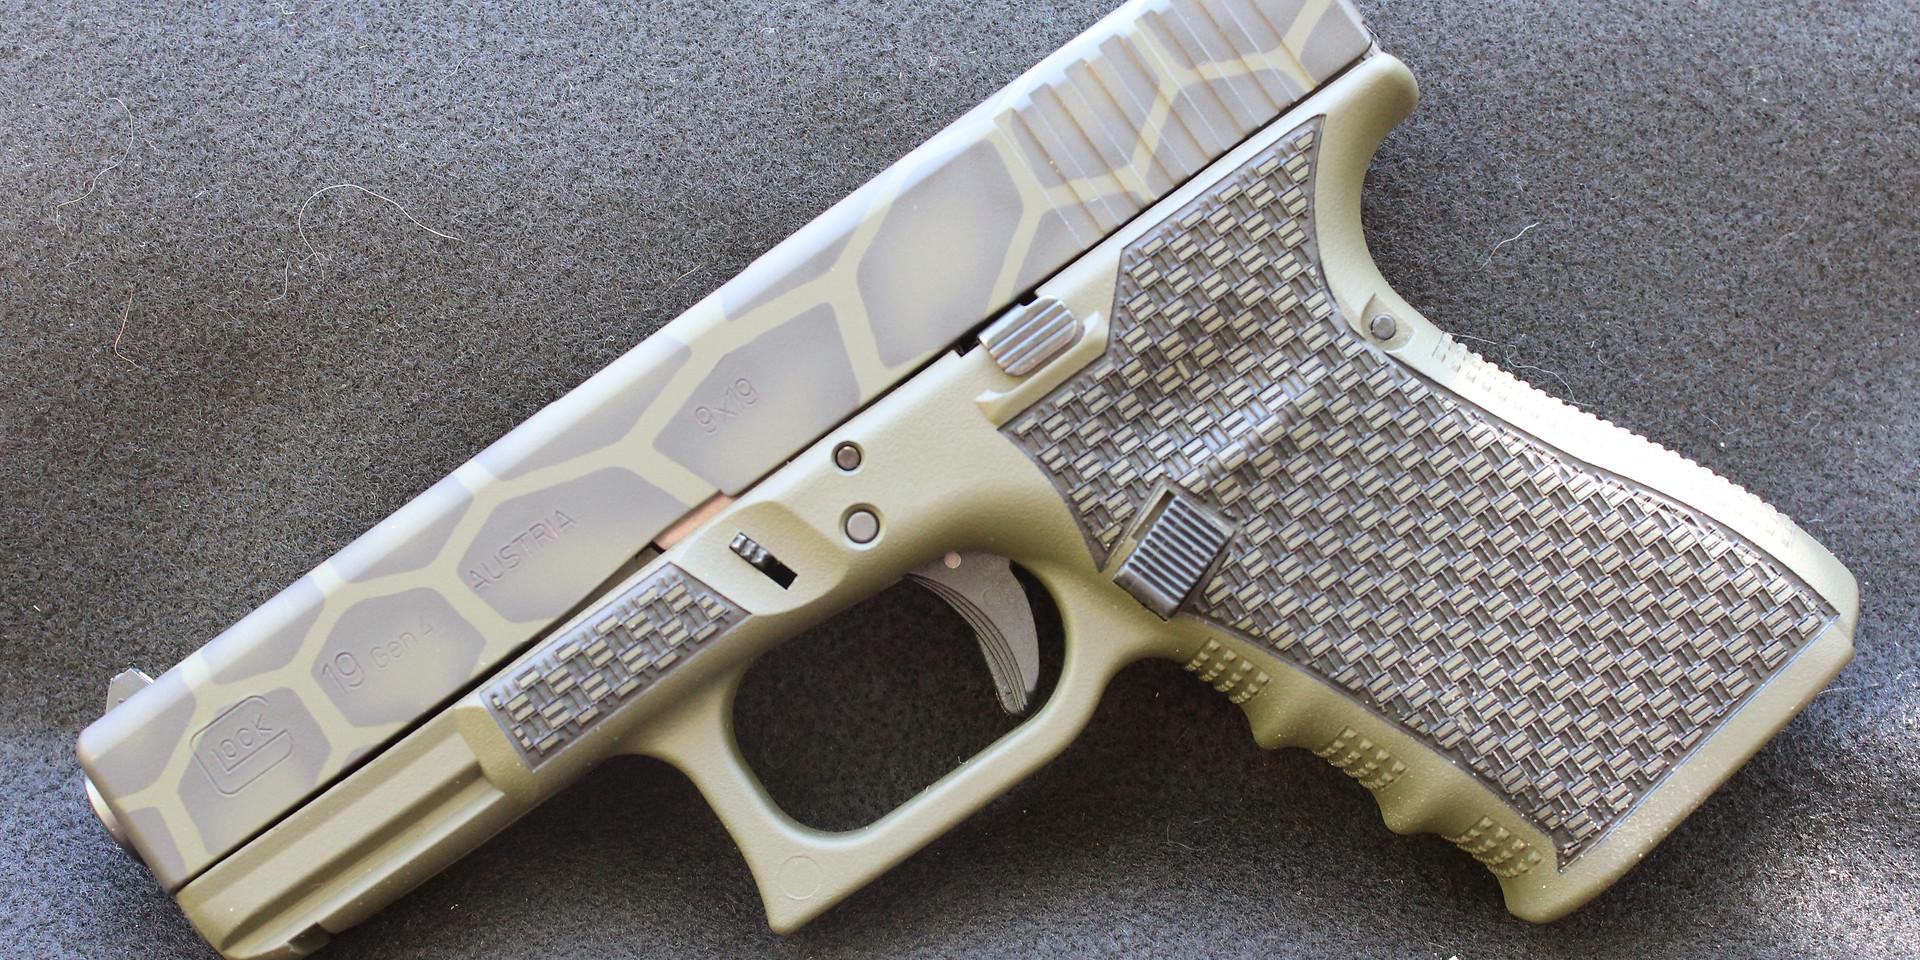 Glock 19 Gen 4 custom